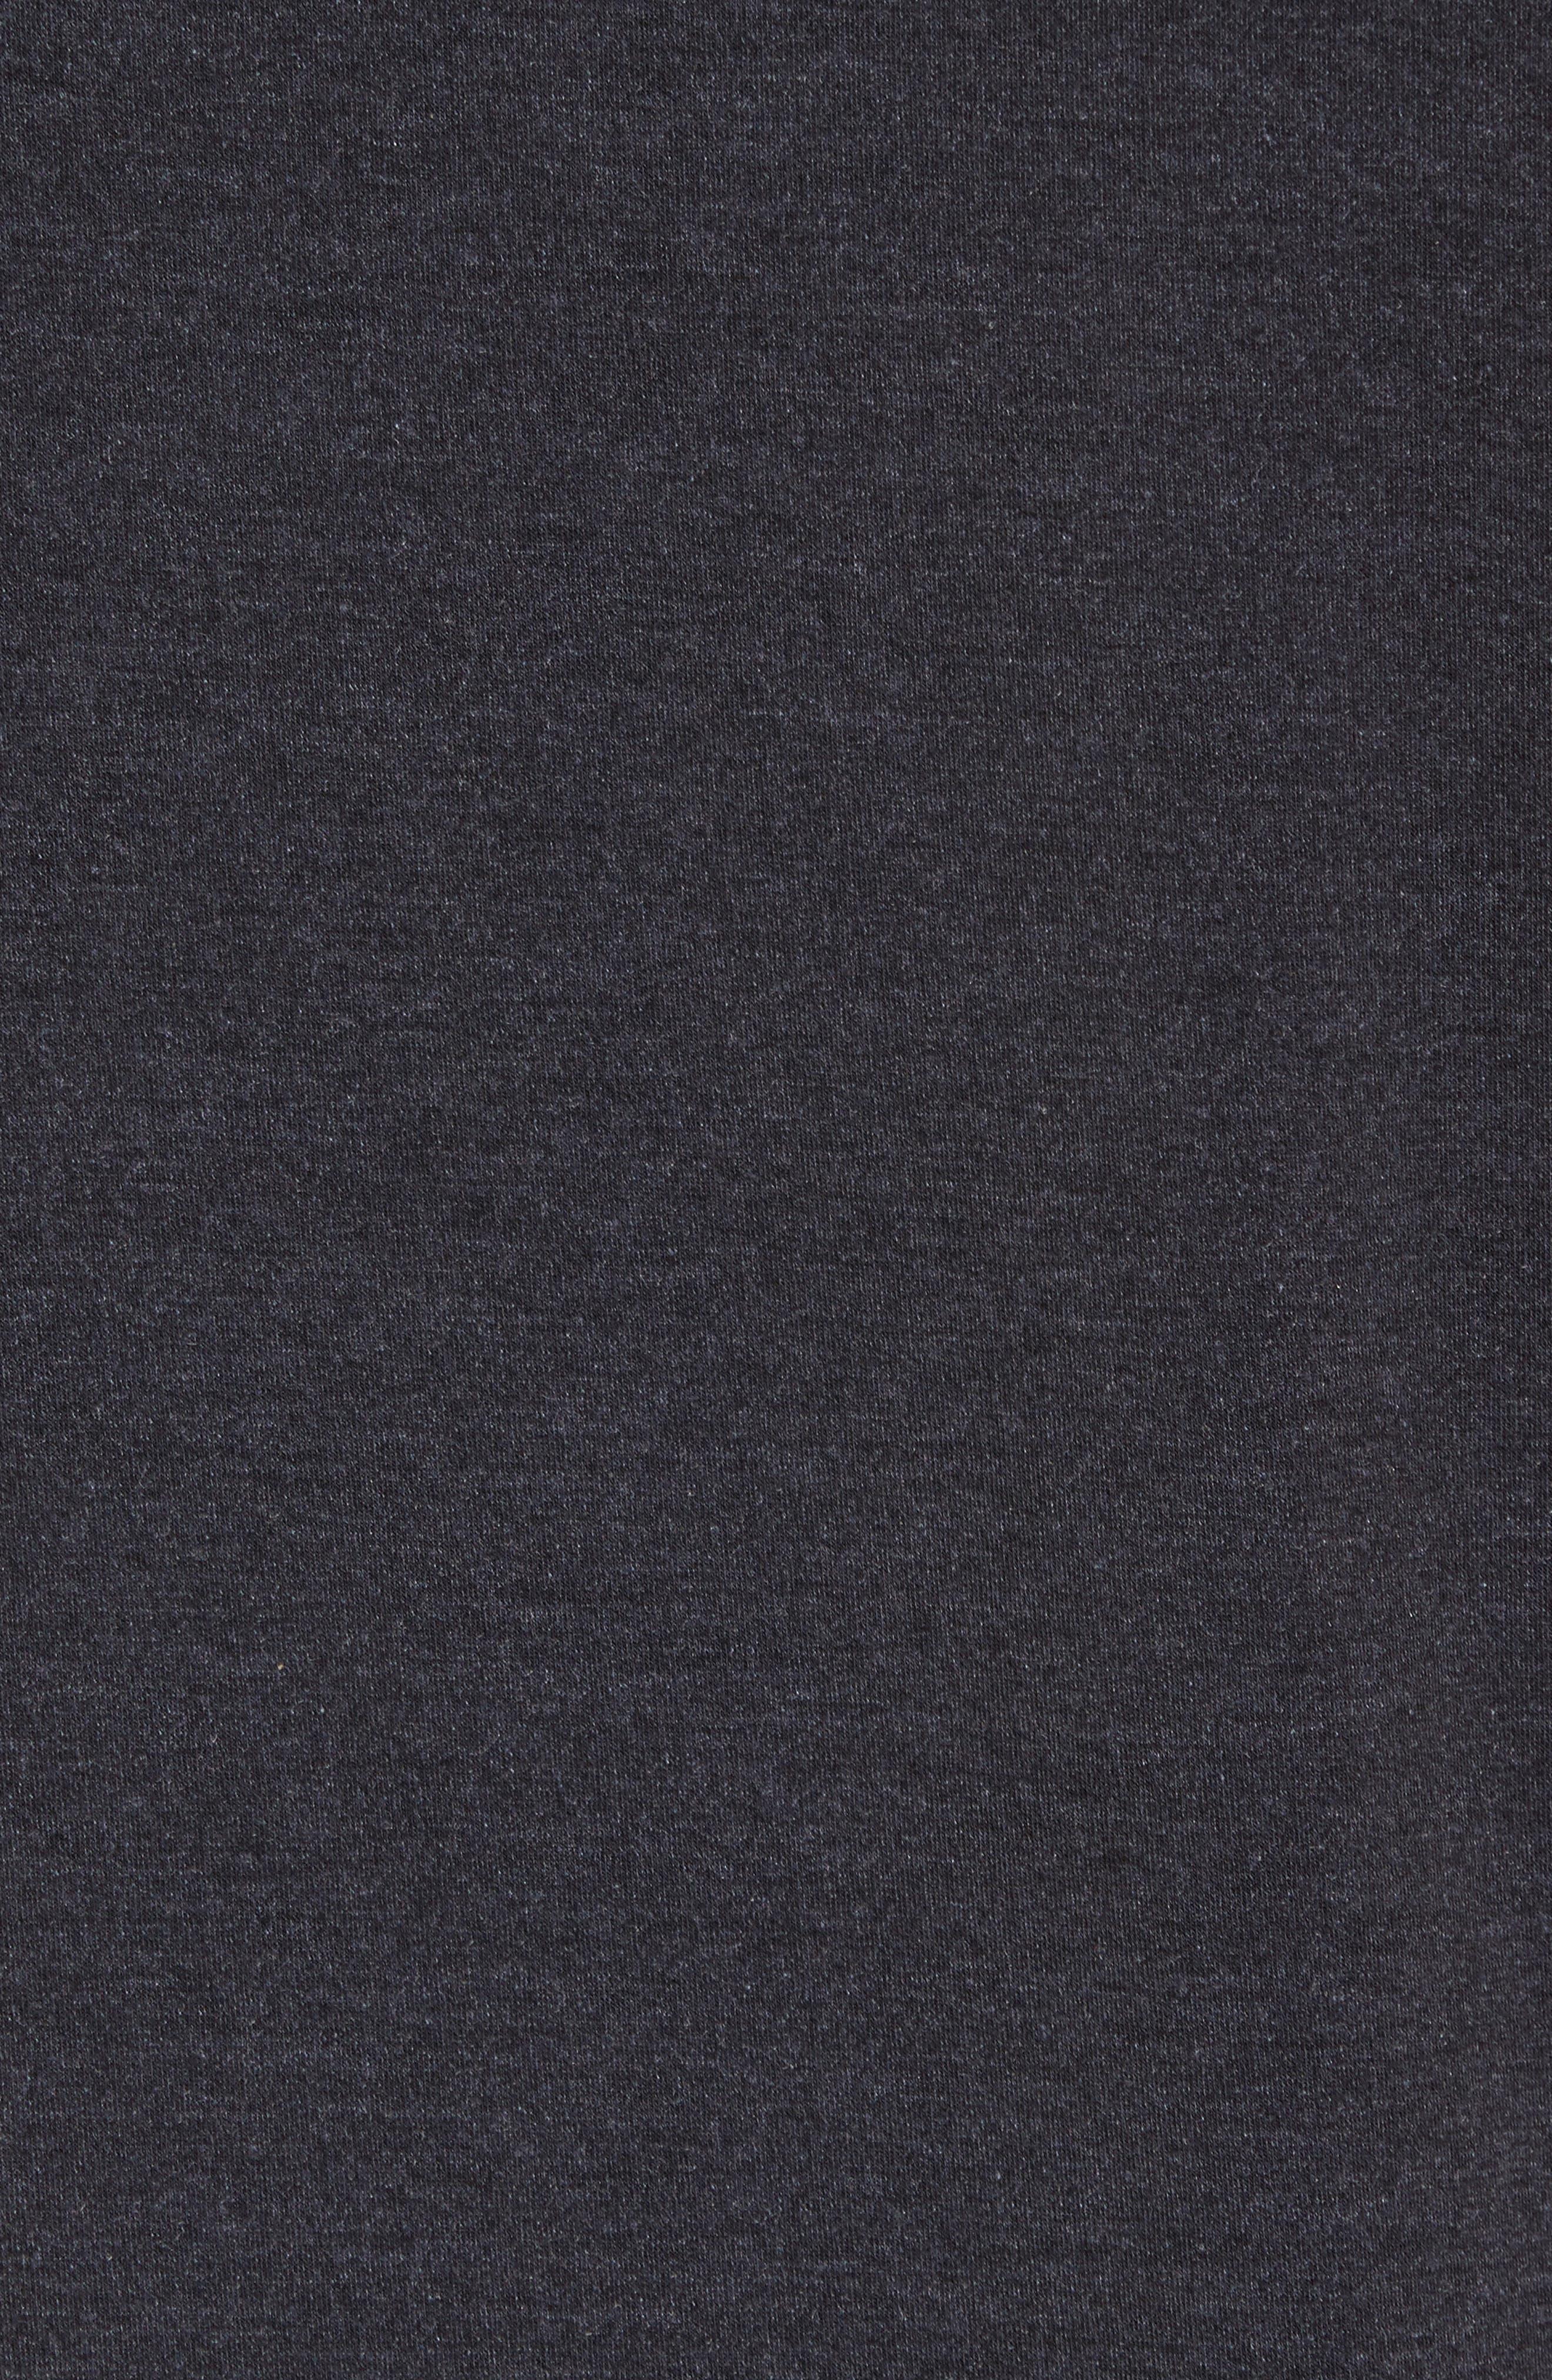 NIKE, Dry Training Day Sleeveless Hoodie, Alternate thumbnail 5, color, BLACK/ BLACK/ WHITE/ HEMATITE